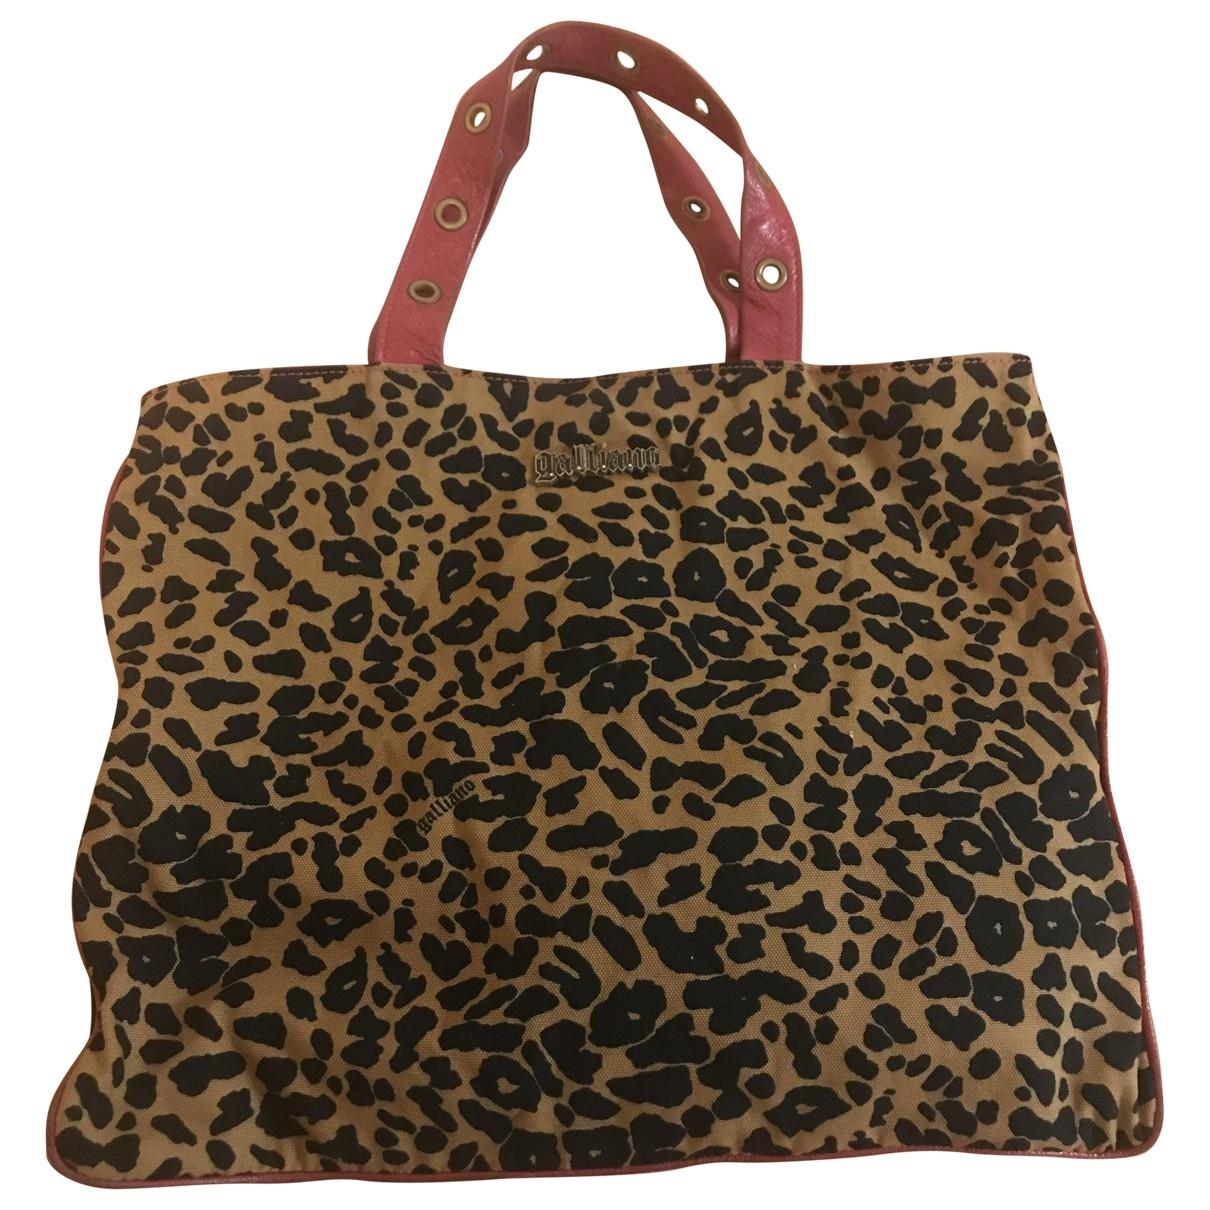 Galliano \N Purple Leather handbag for Women \N